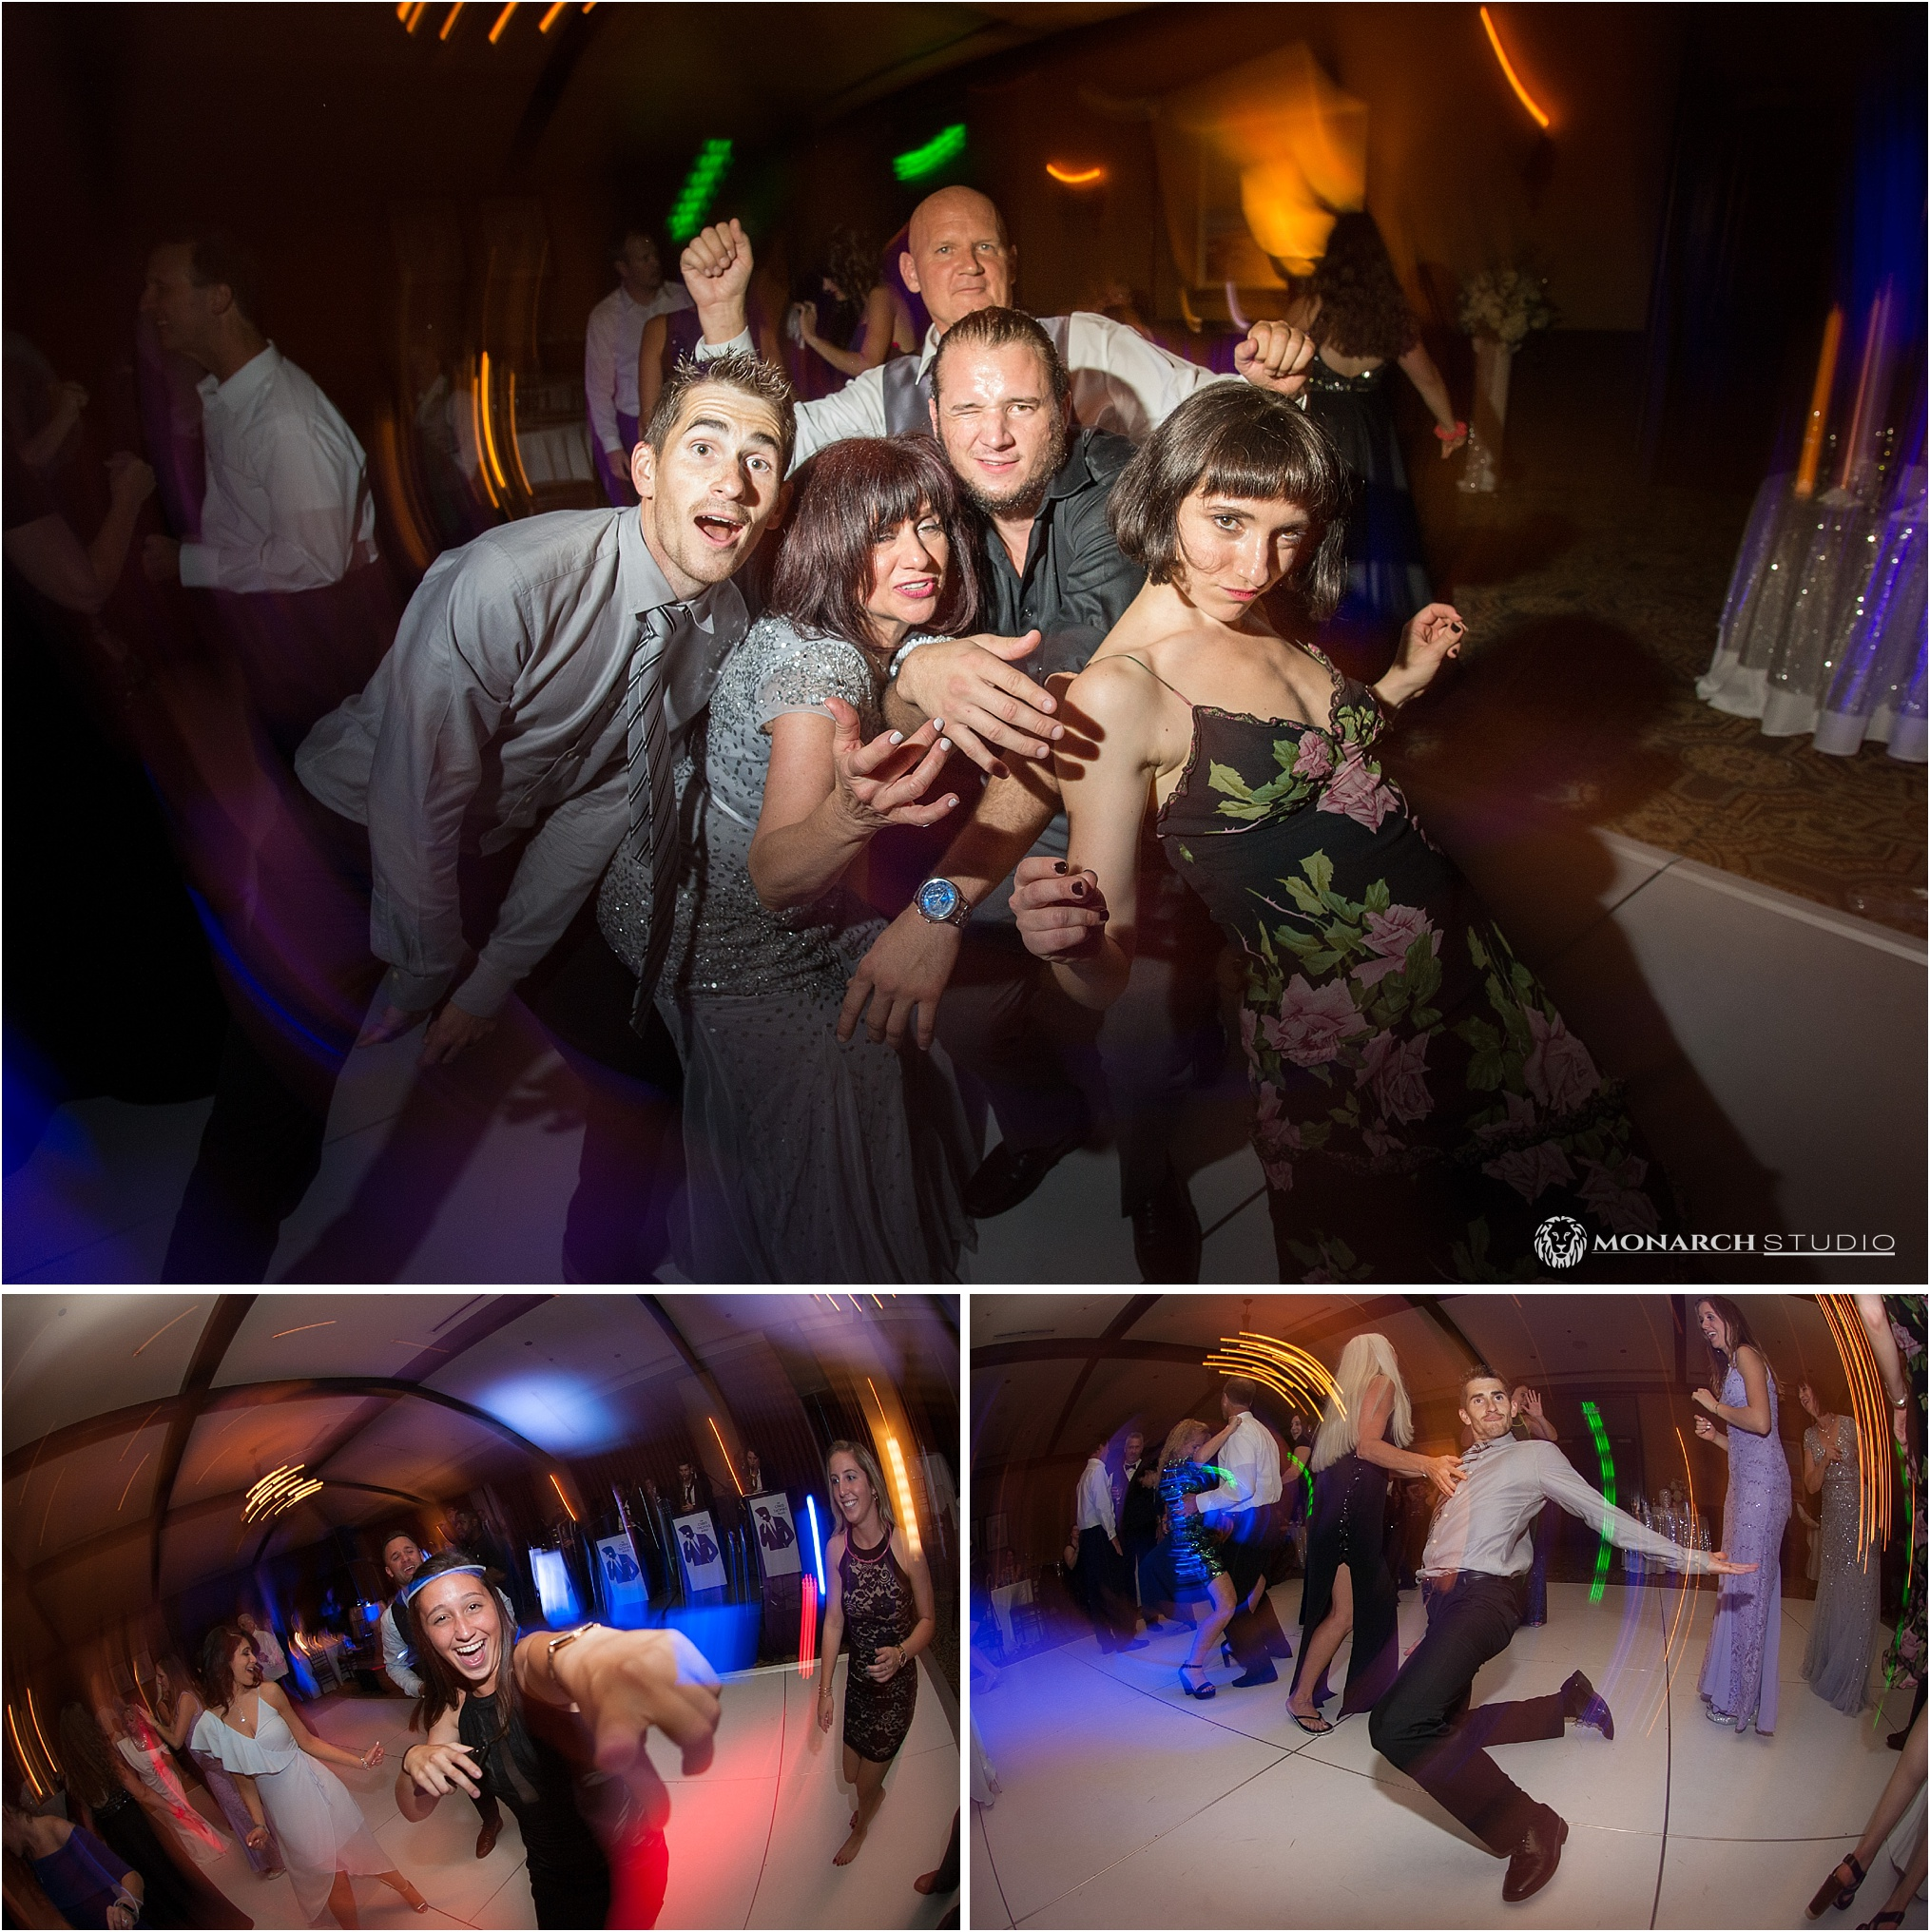 ponte-vedra-wedding-photographer-tpc141.jpg